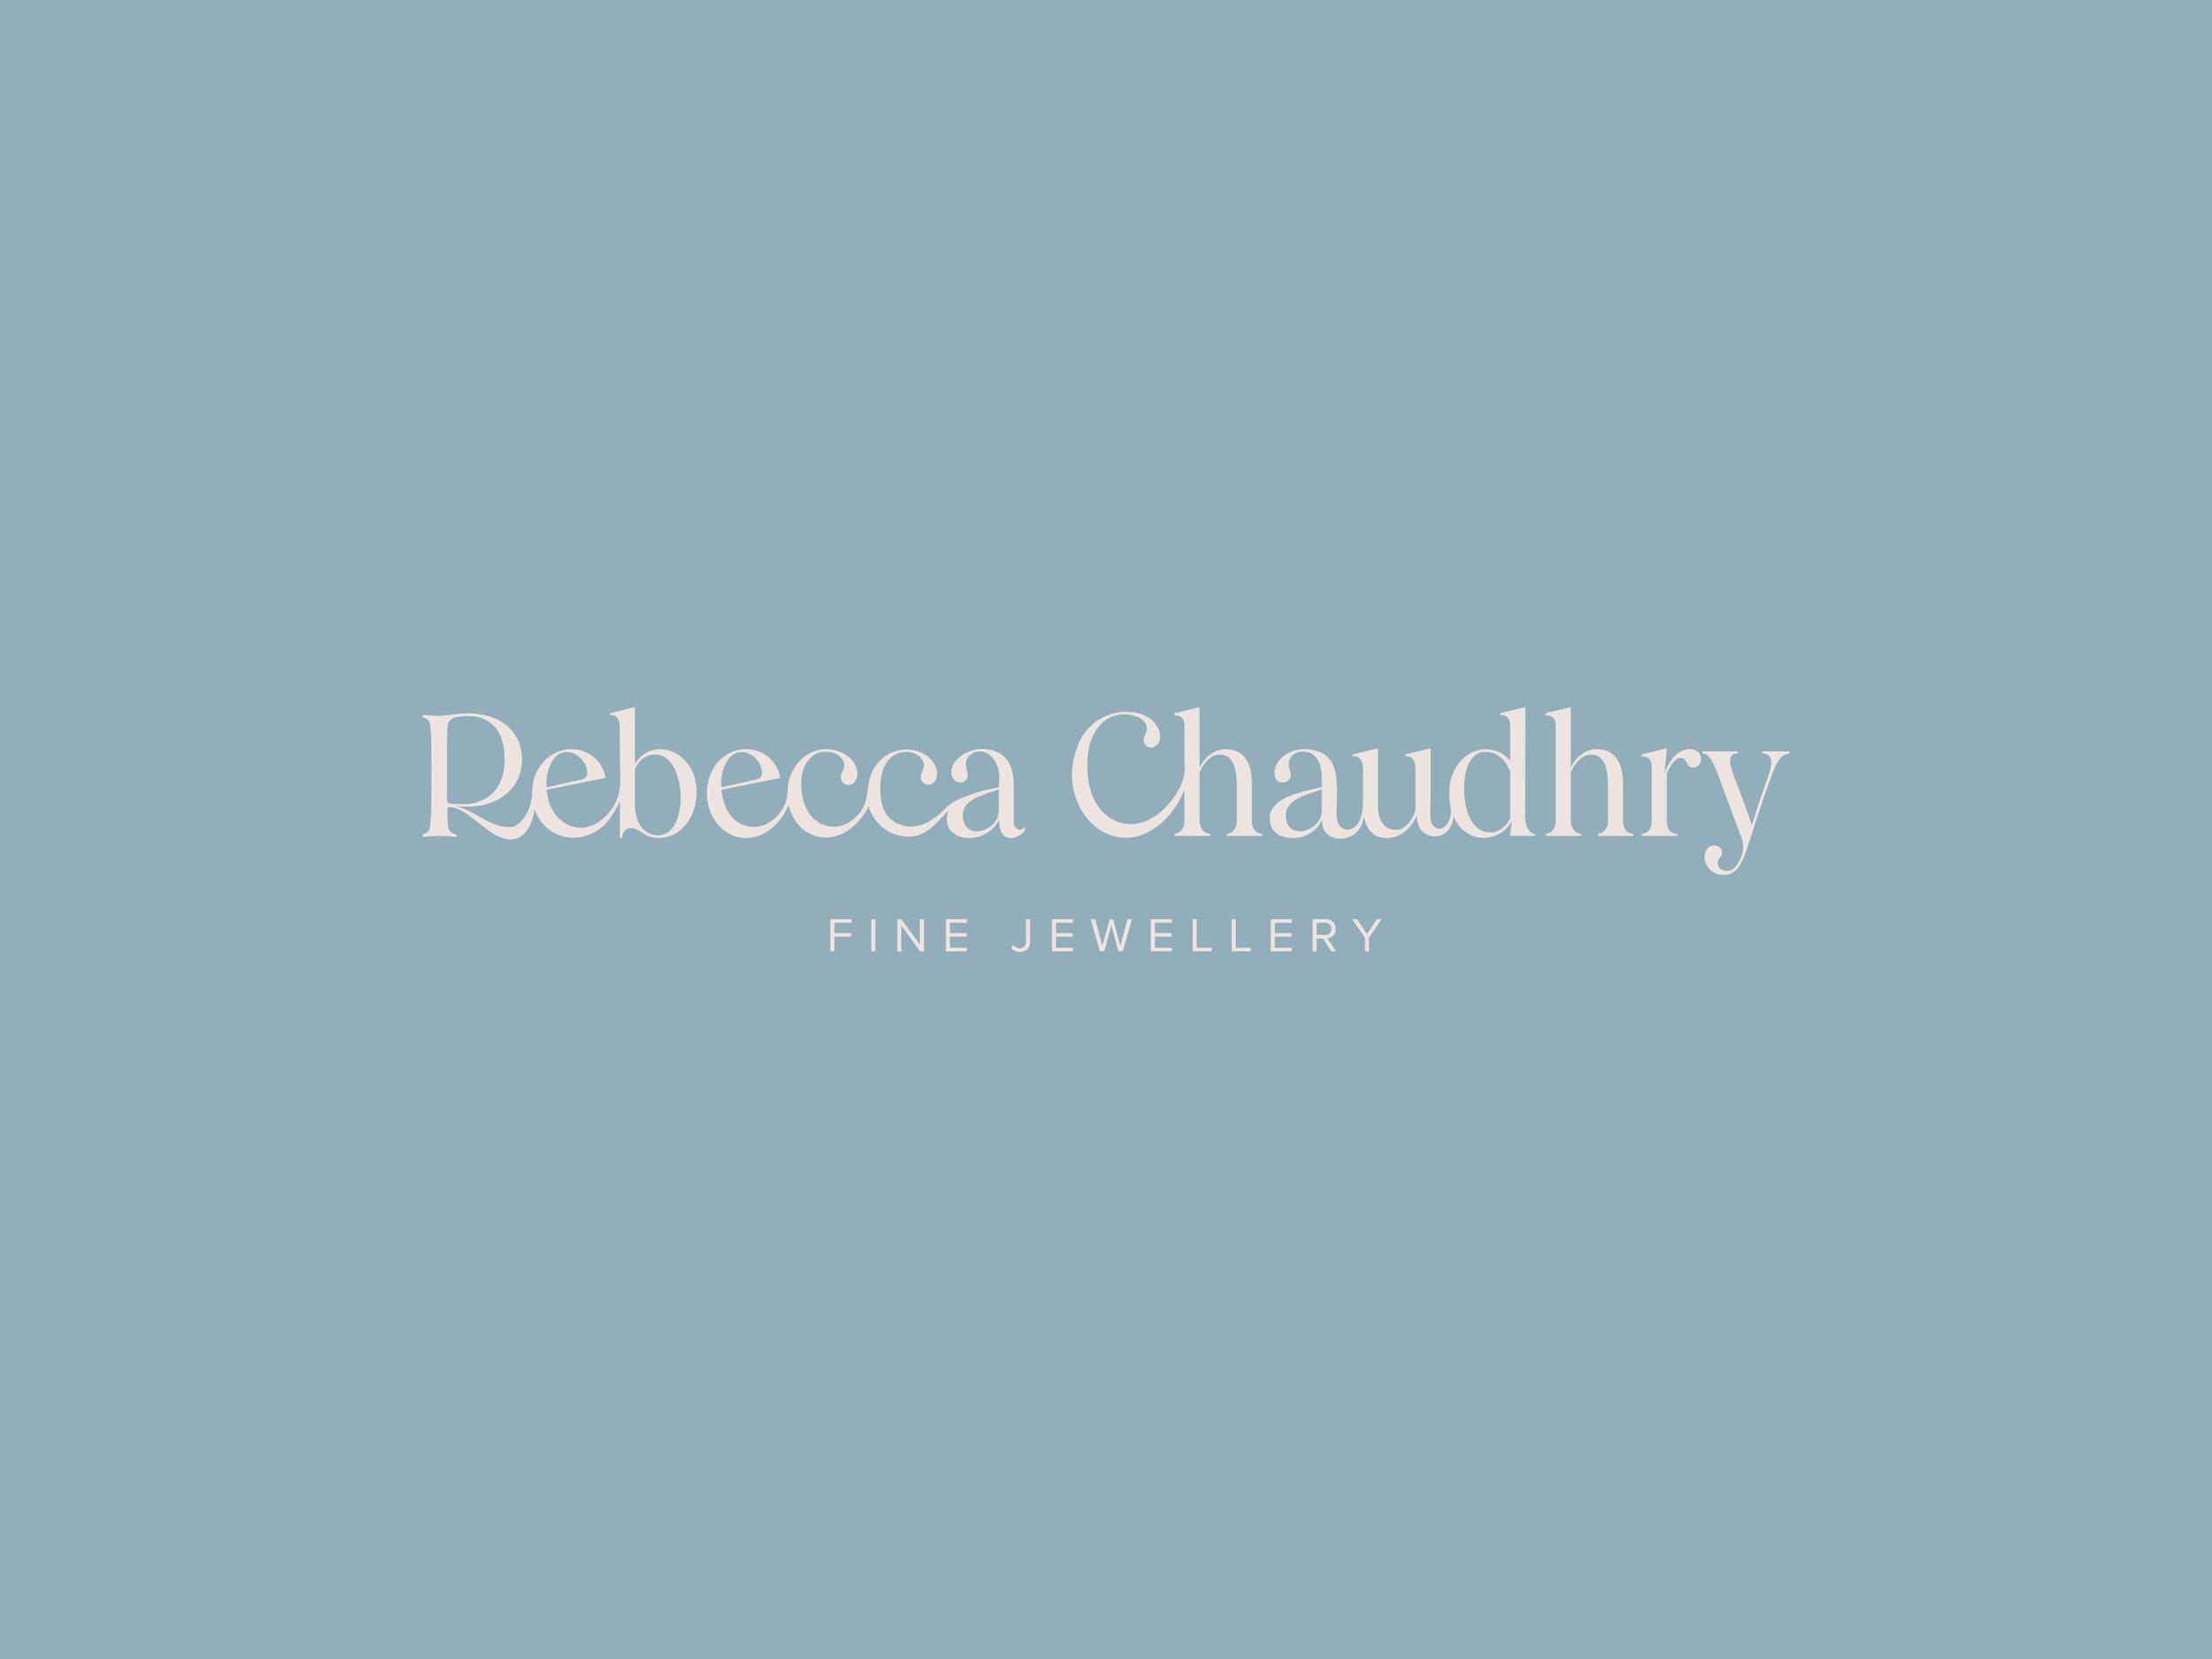 Rebecca-Chaudhry-01.jpg